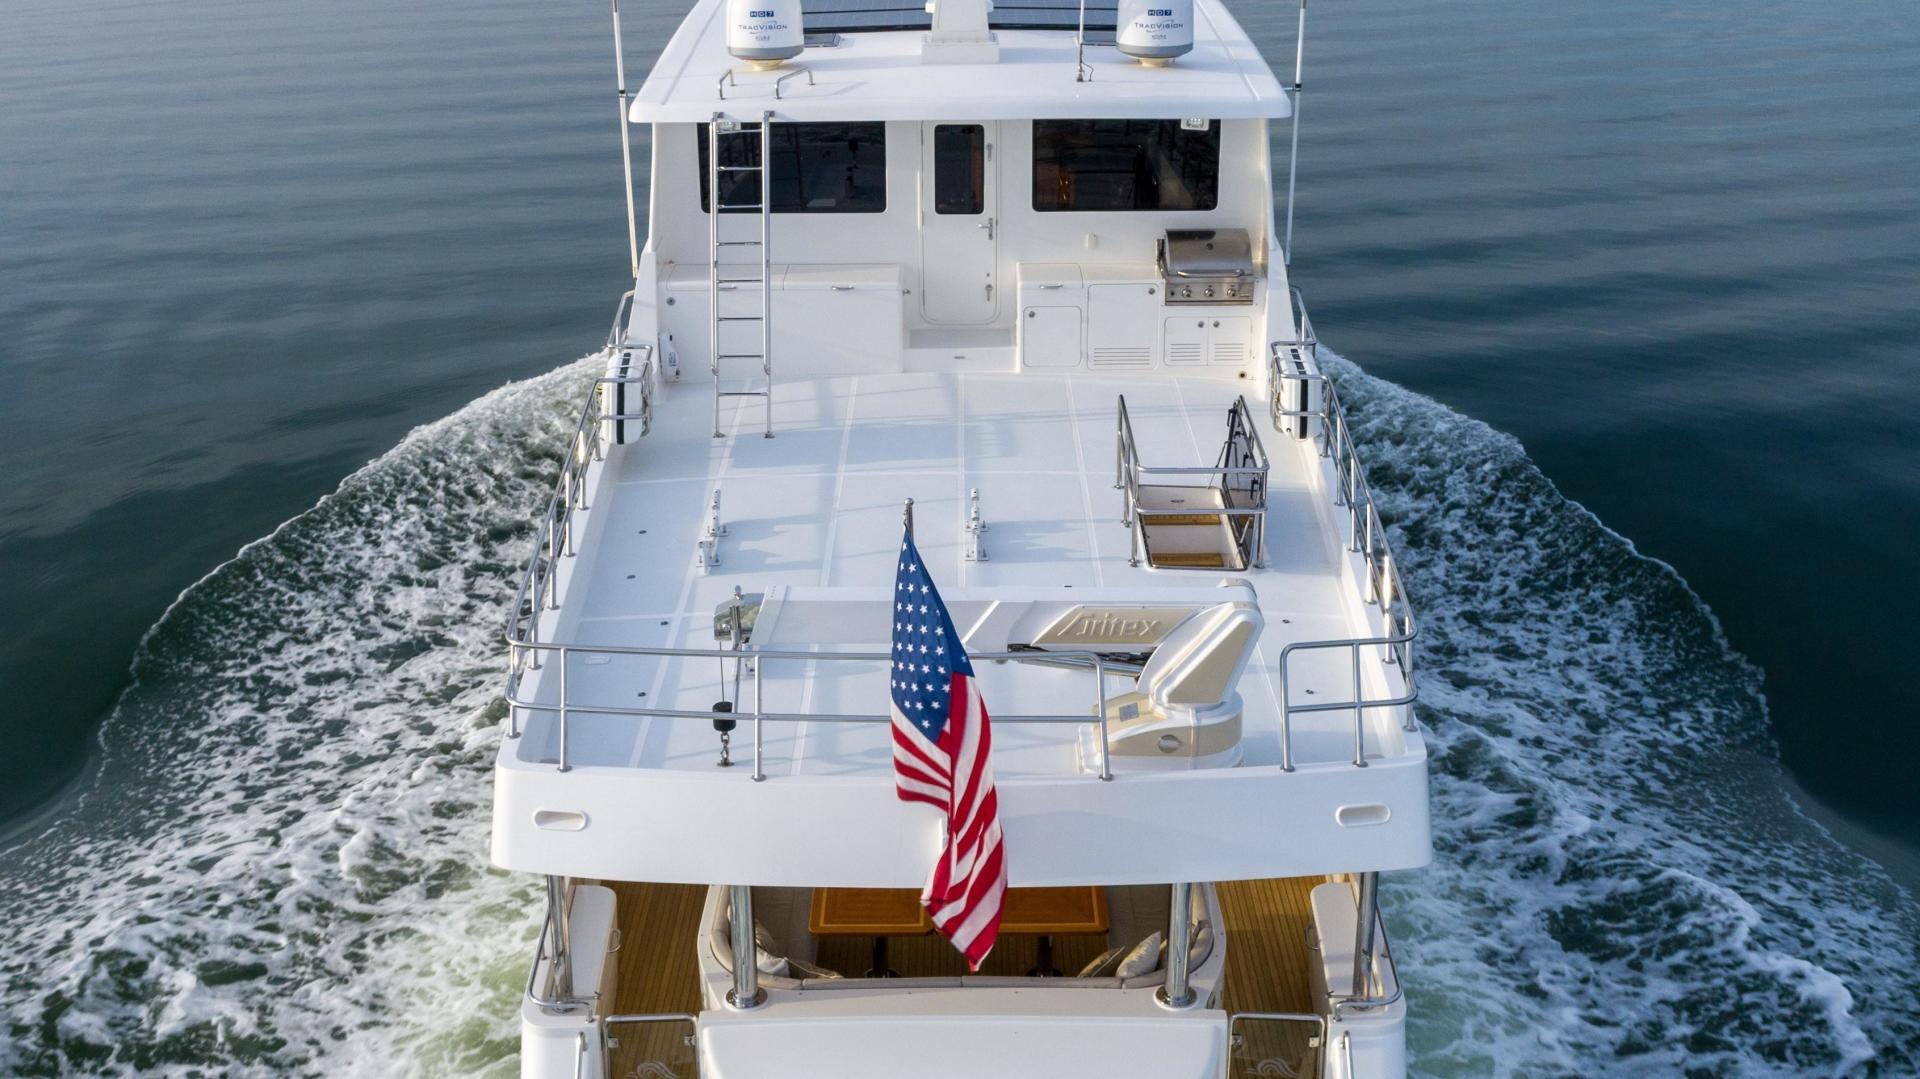 Outer Reef Yachts-860 DBMY 2017-Simon Says Vero Beach-Florida-United States-1488213 | Thumbnail